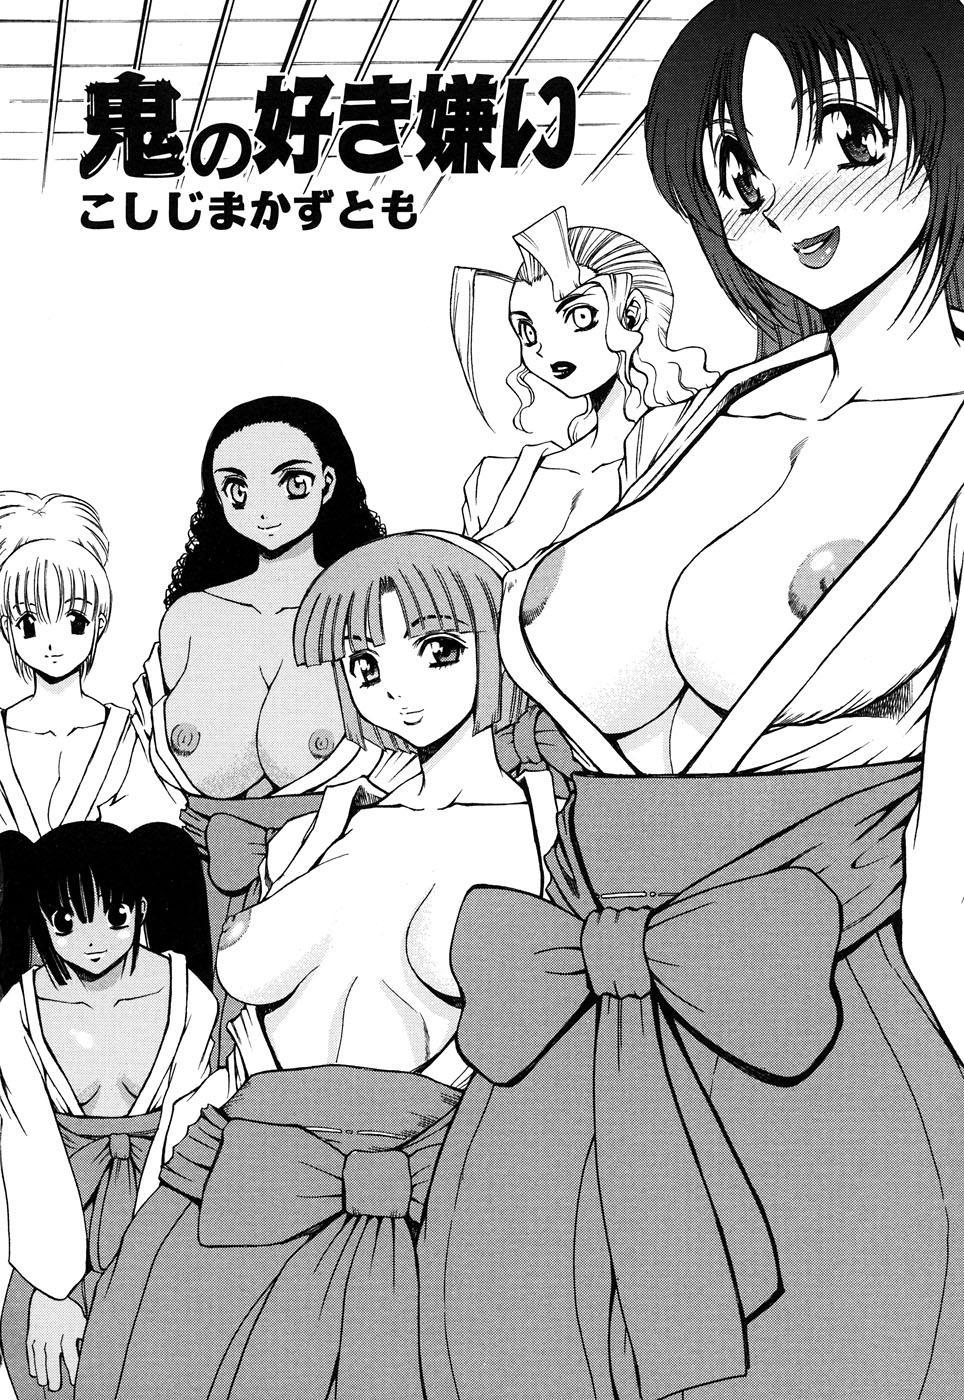 Fechikko VS Series ROUND.2 Miko San VS Maid San 54